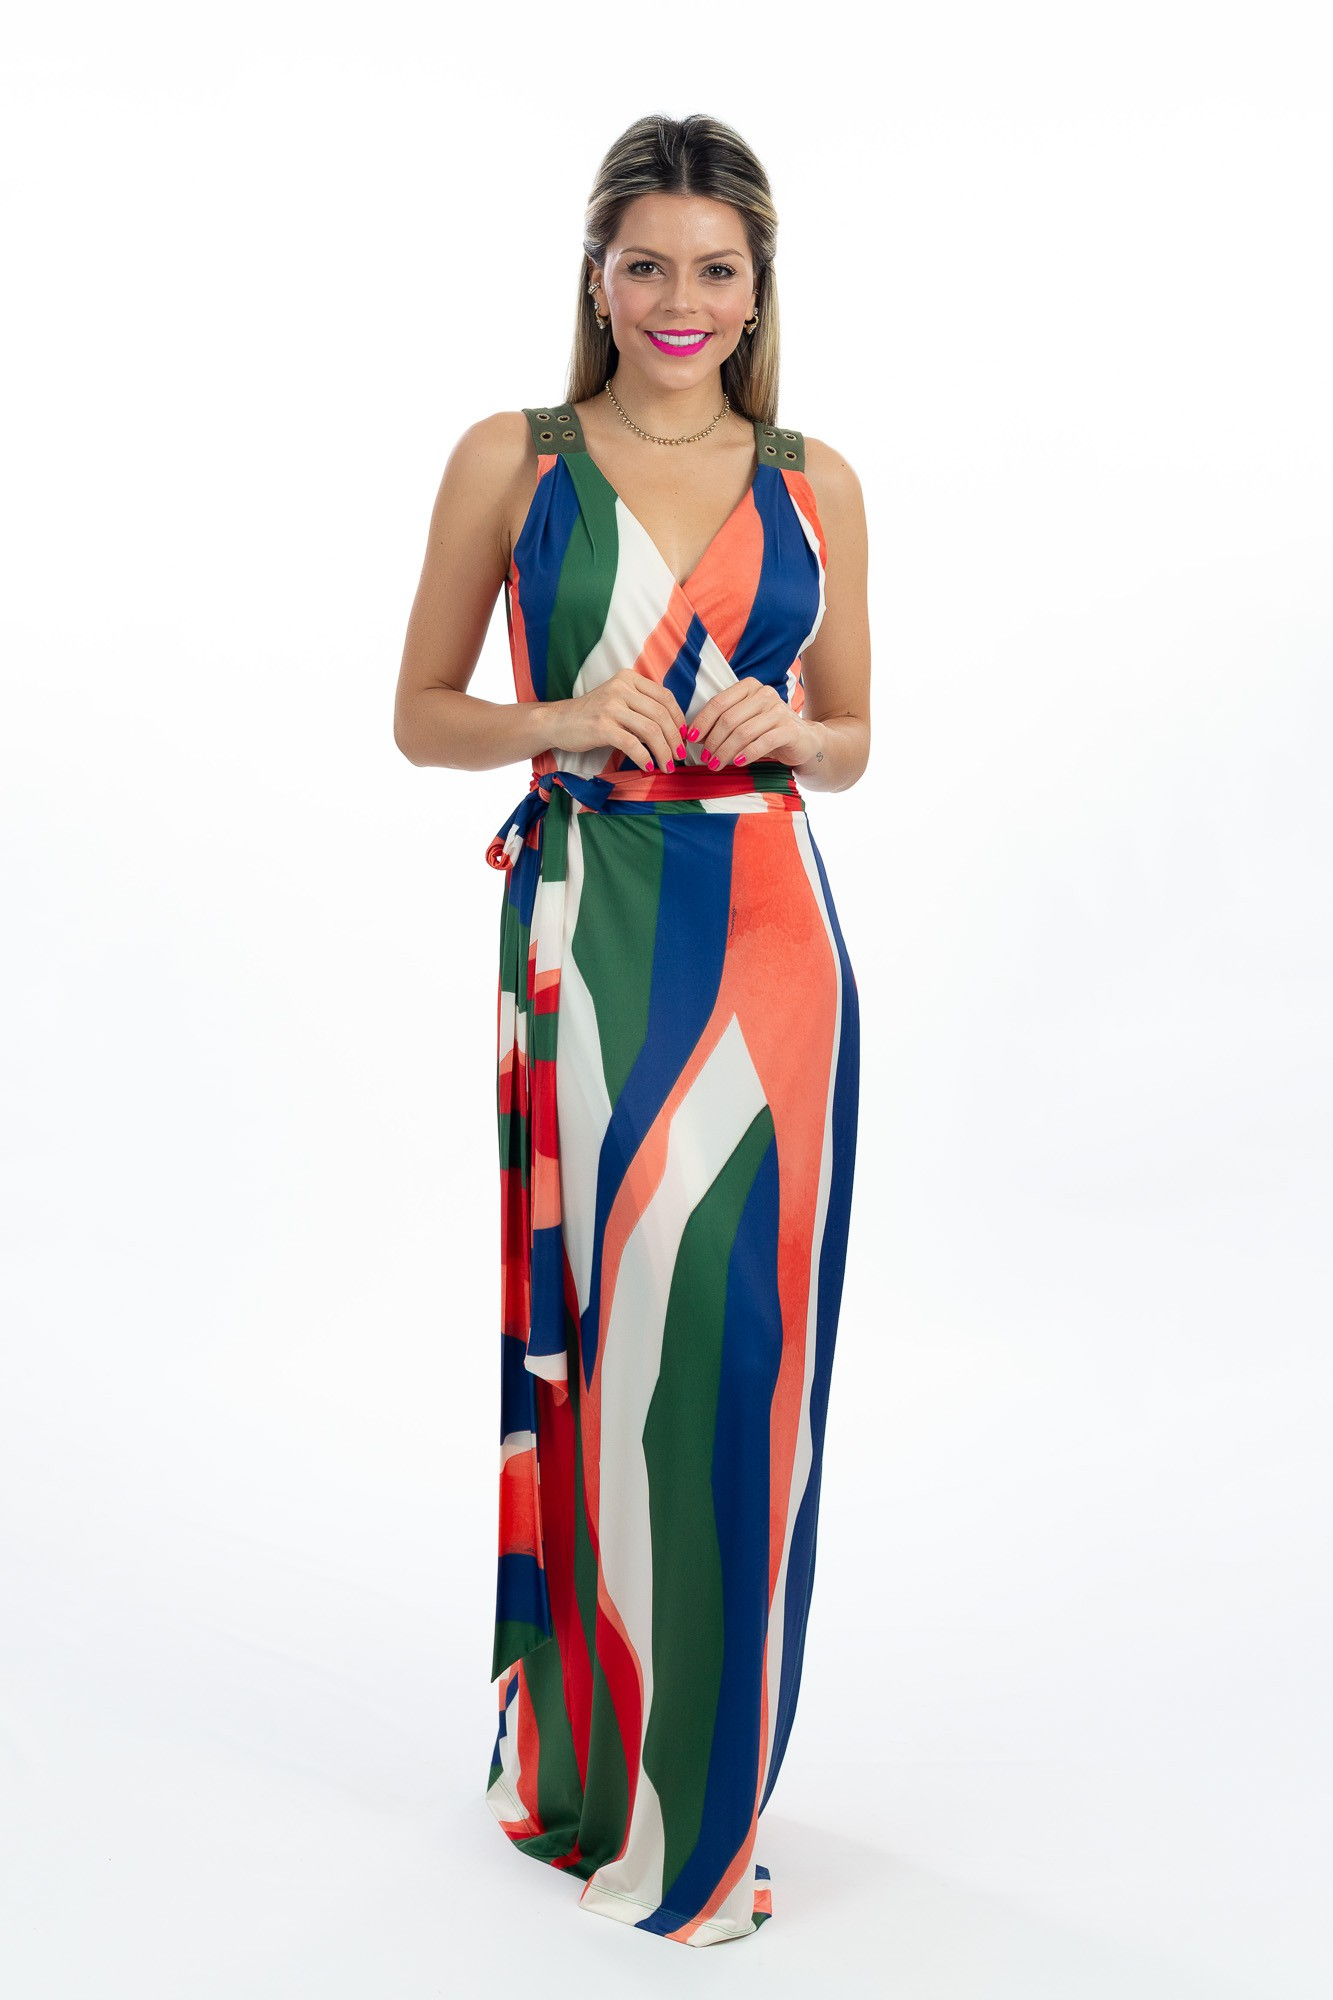 Vestido jersey transpassado estampa colorida Alphorria tam 42